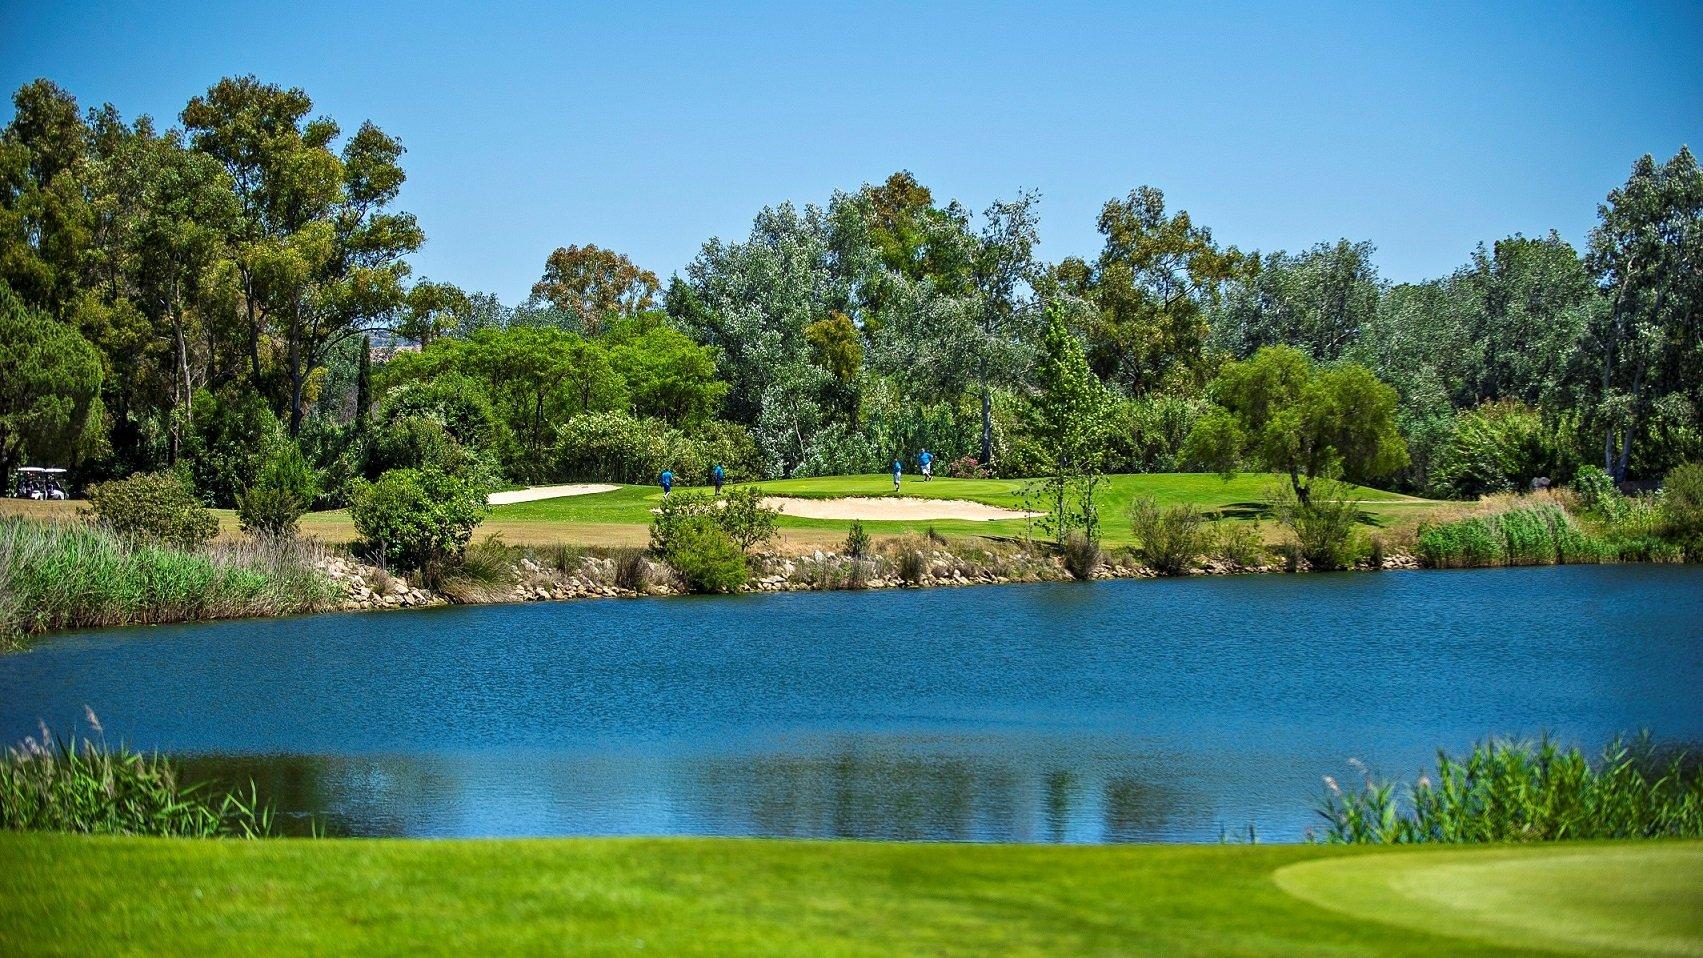 Algarve golf courses.